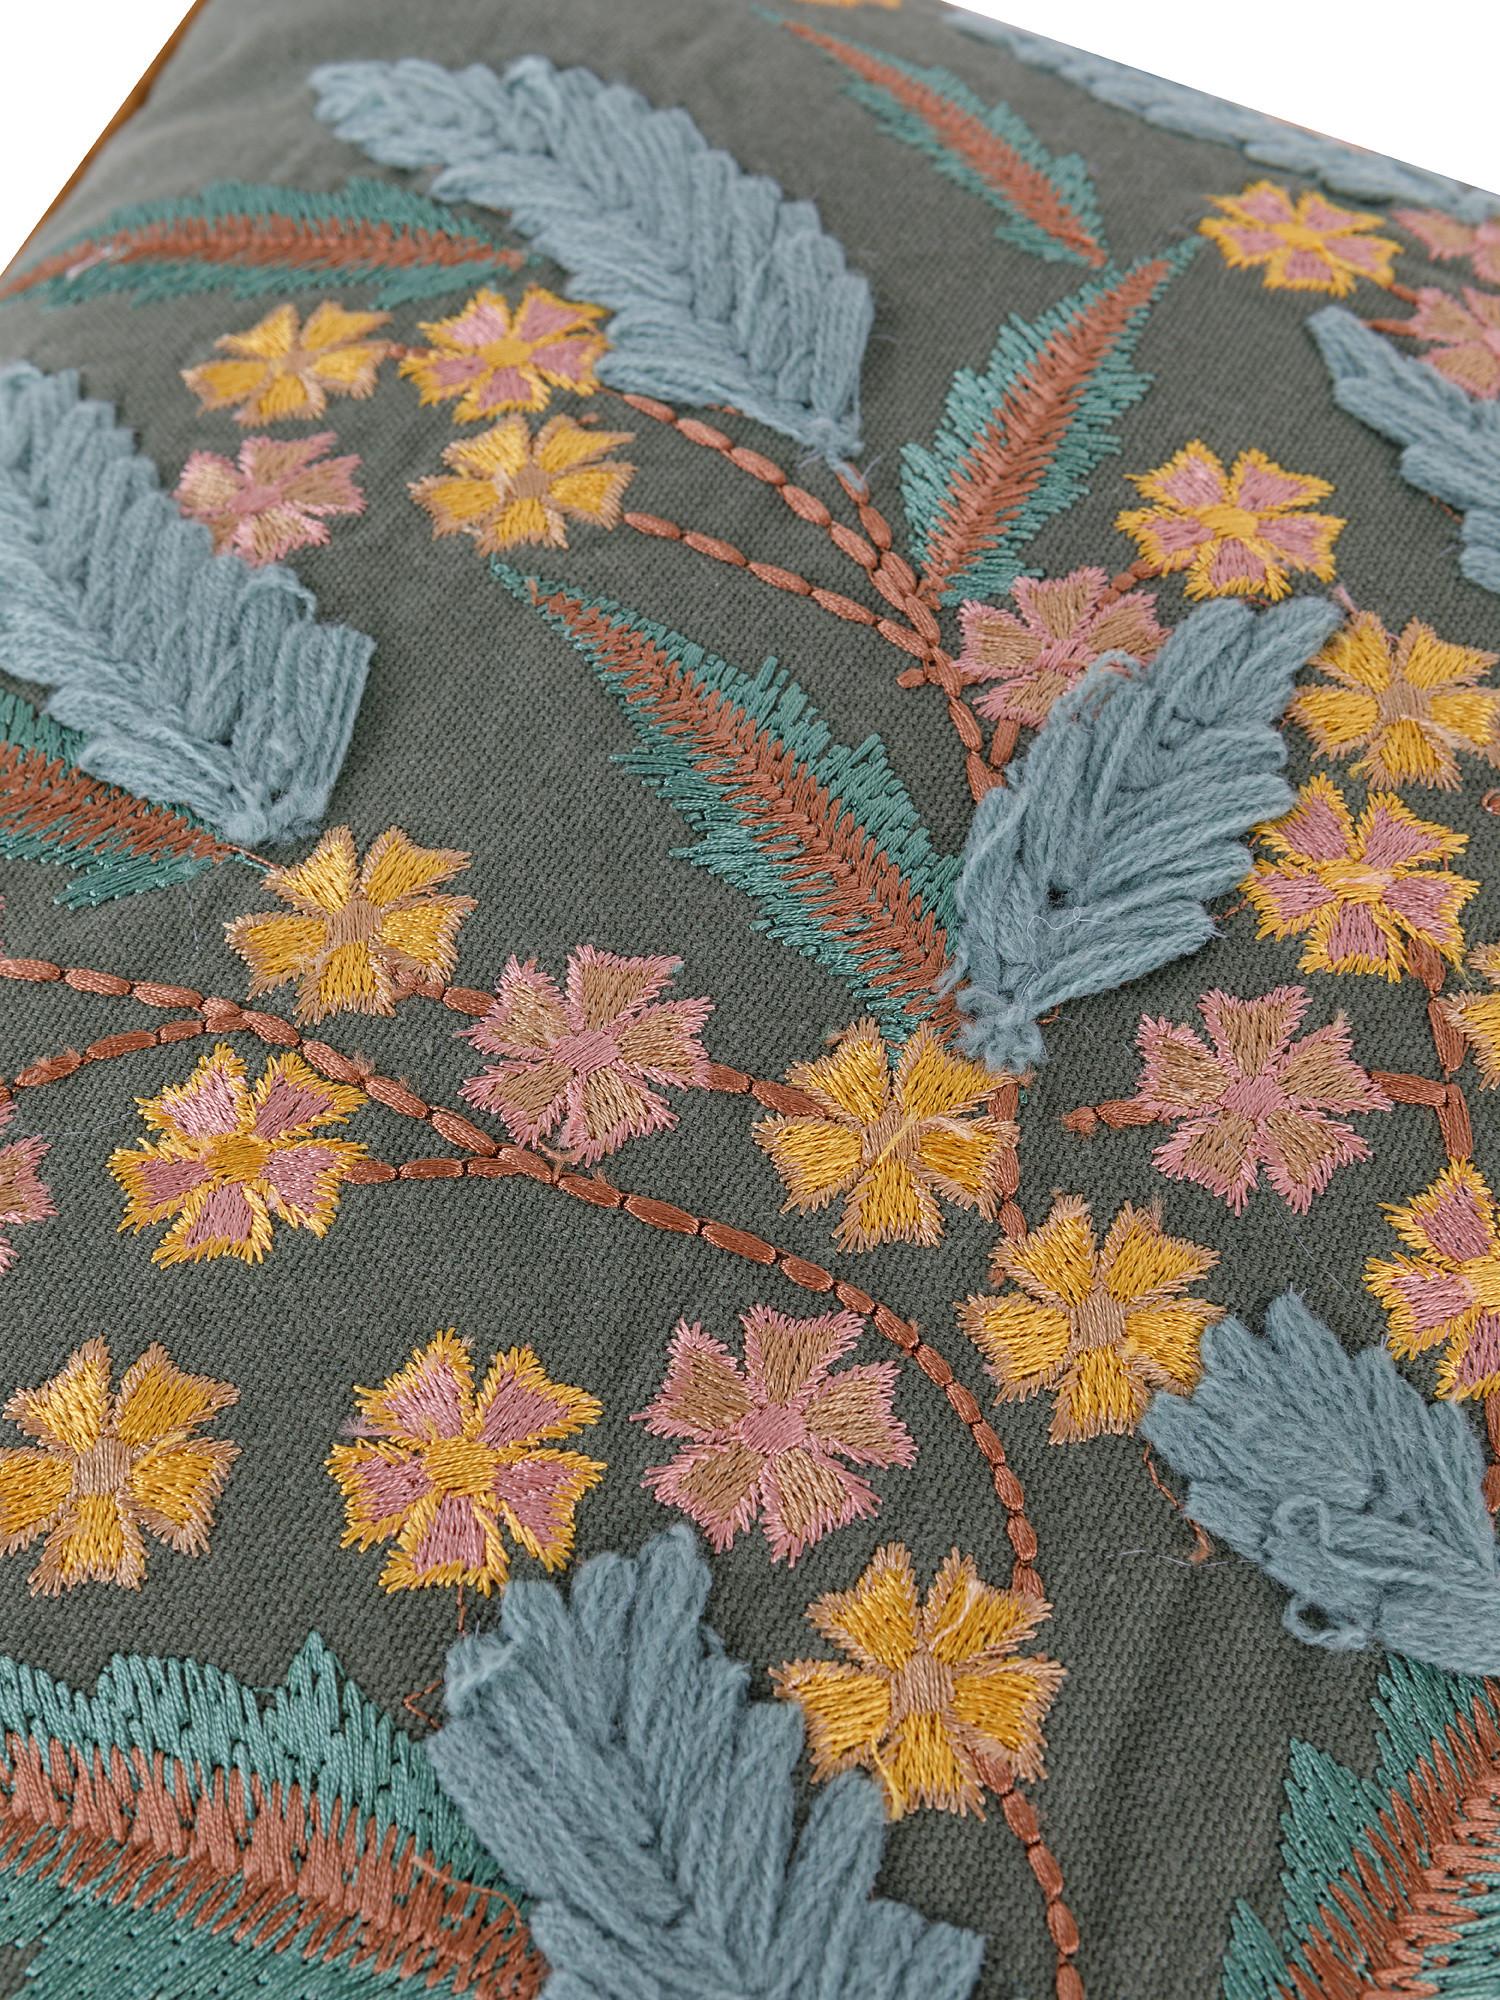 Cuscino cotone ricamo bouquet 45x45cm, Multicolor, large image number 2